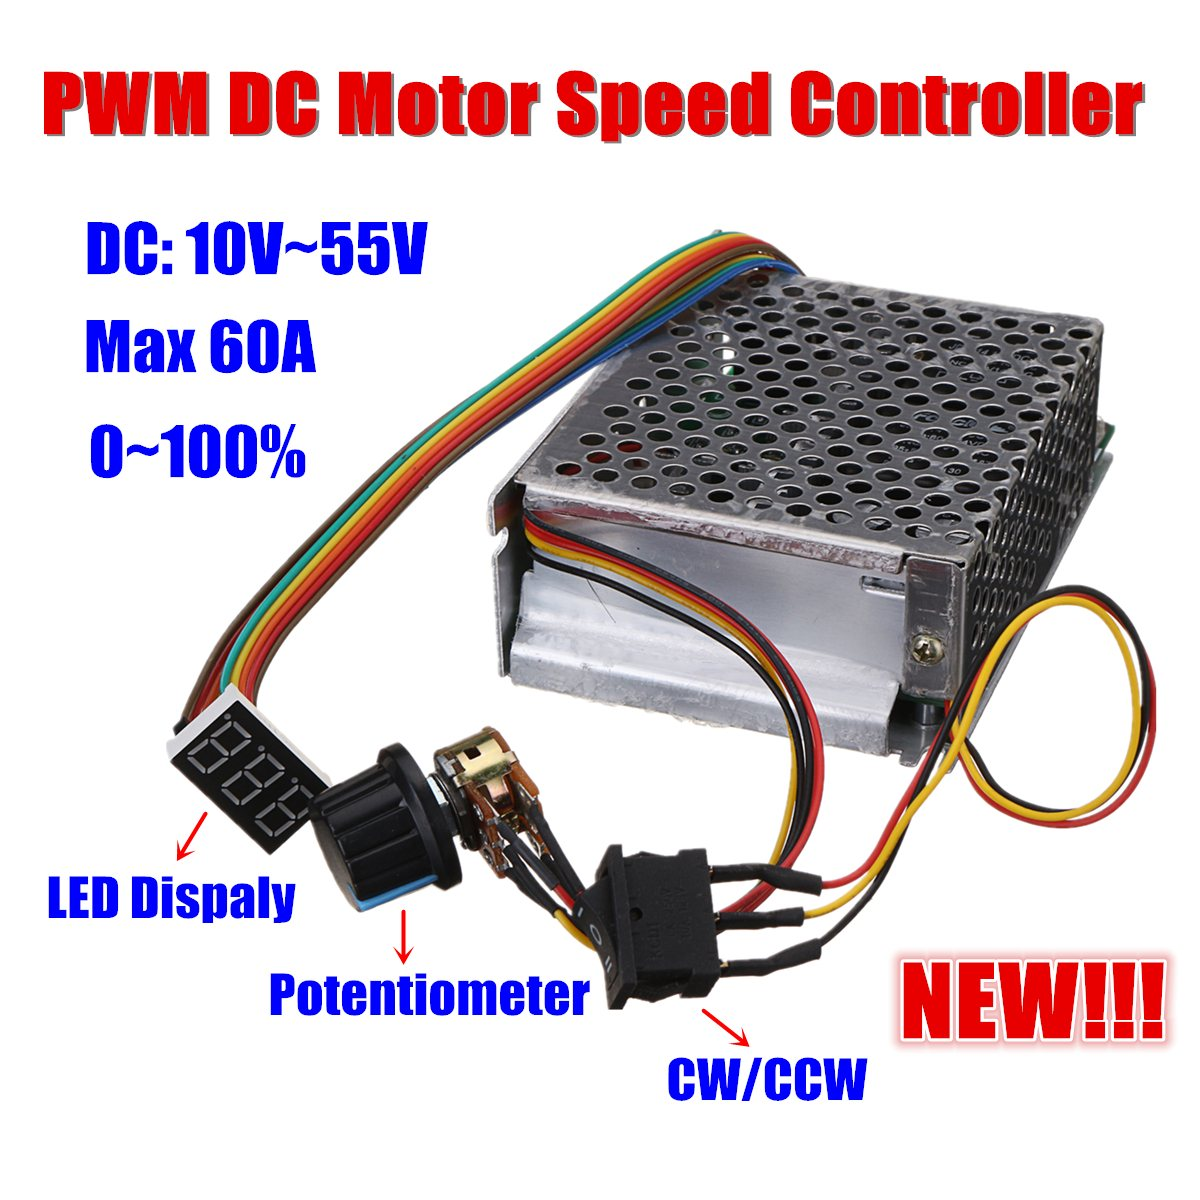 все цены на Reversible DC Motor Speed Controller DC10-50V 60A 3000W PWM Control 12V 24V 36V 48V Forward-Stop-Reversal Brake Digital Display онлайн